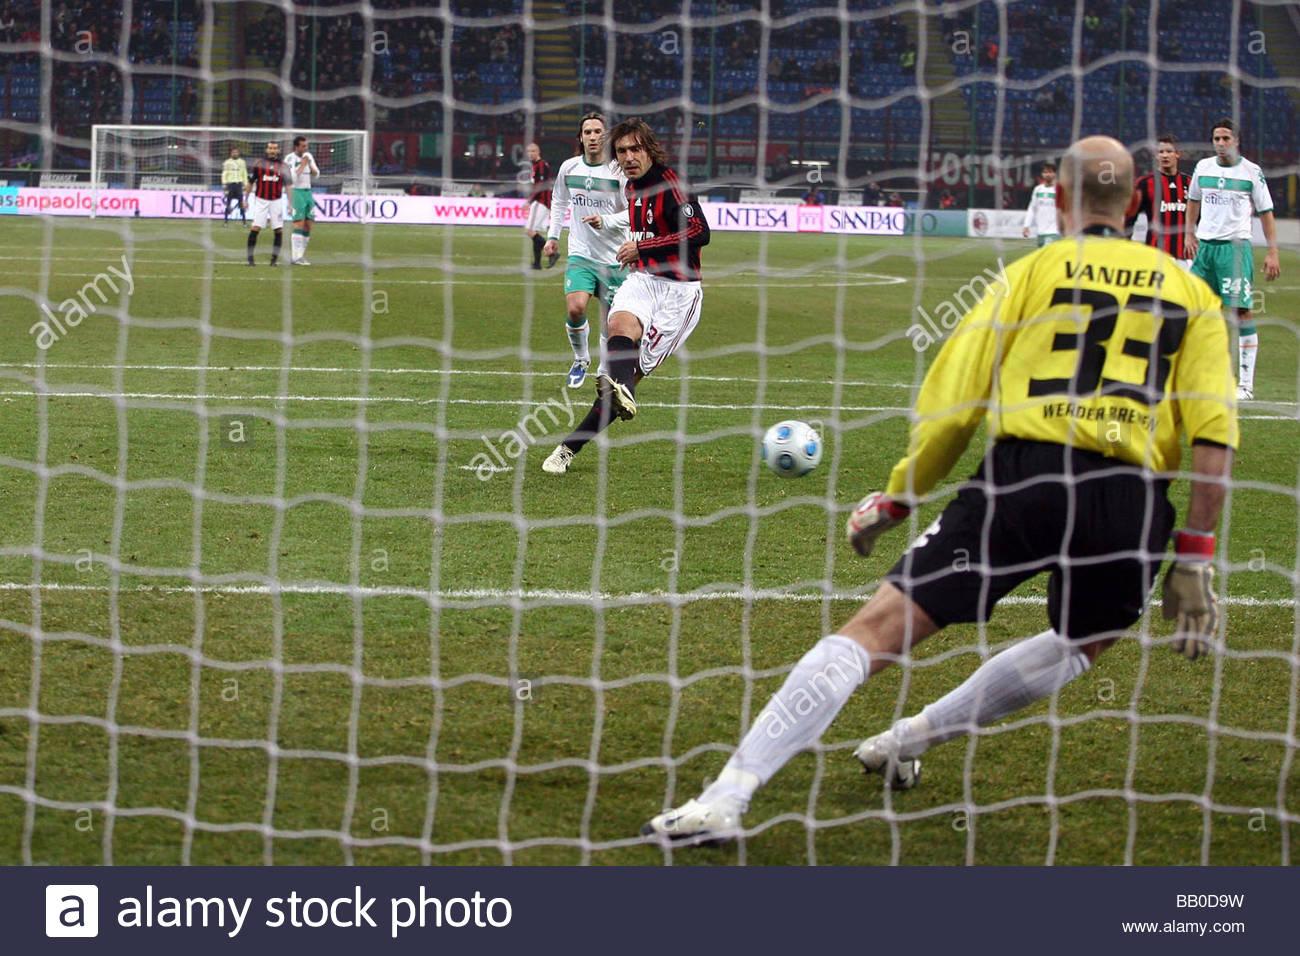 andrea pirlo scores the penalty,milano 2009,uefa cup 2008/2009,milan-werder brema - Stock Image